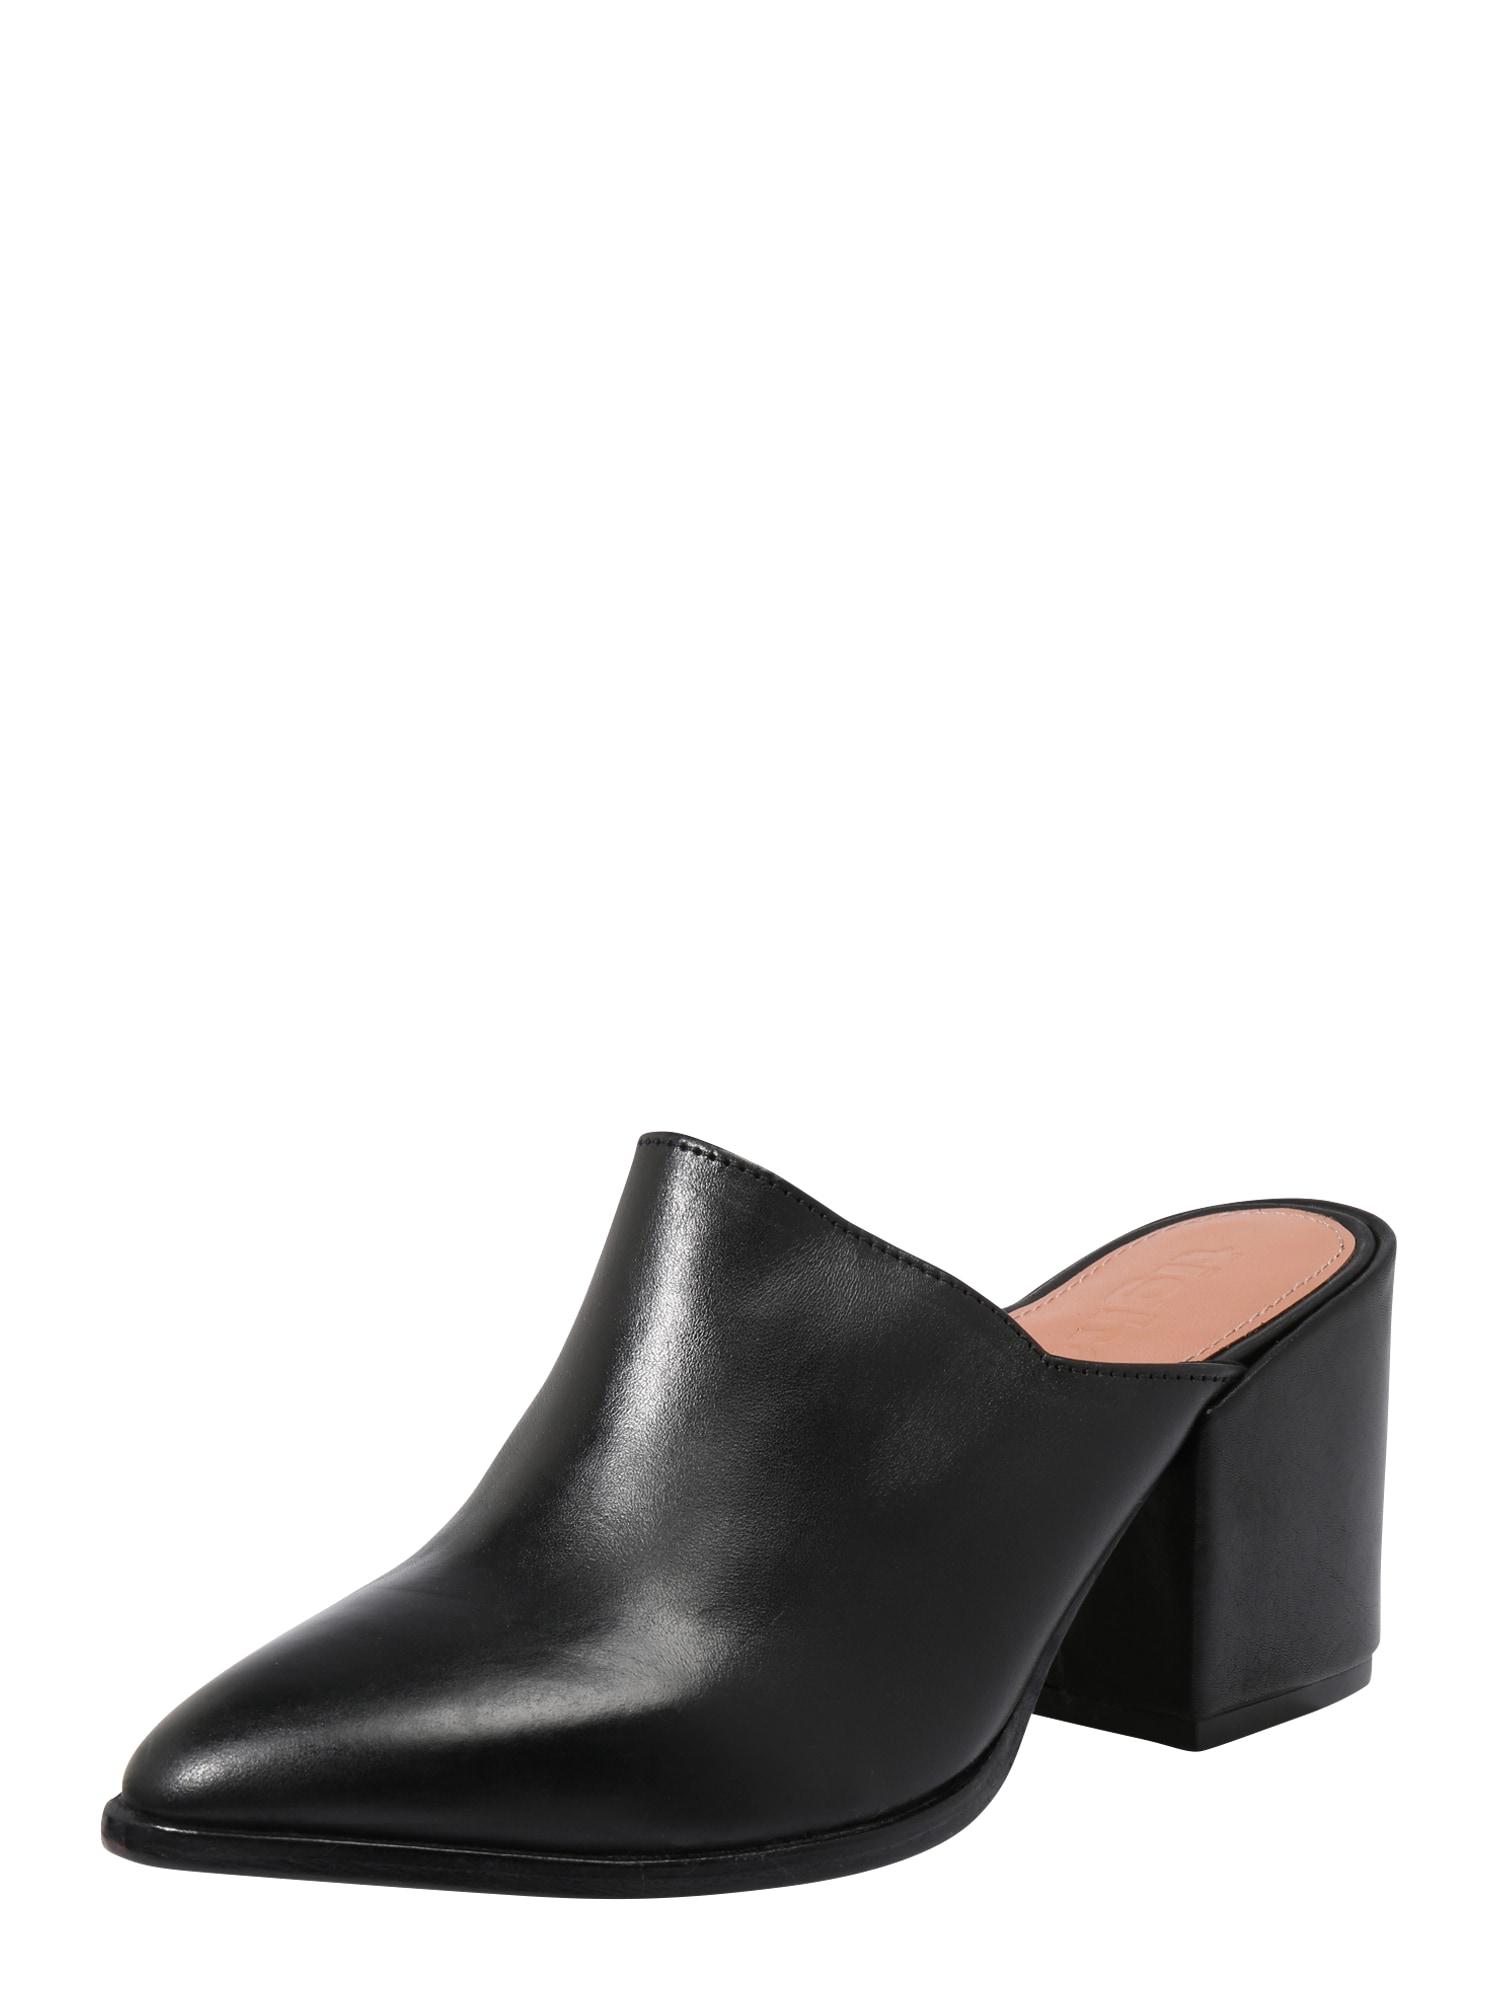 Pantofle Febe černá Tigha